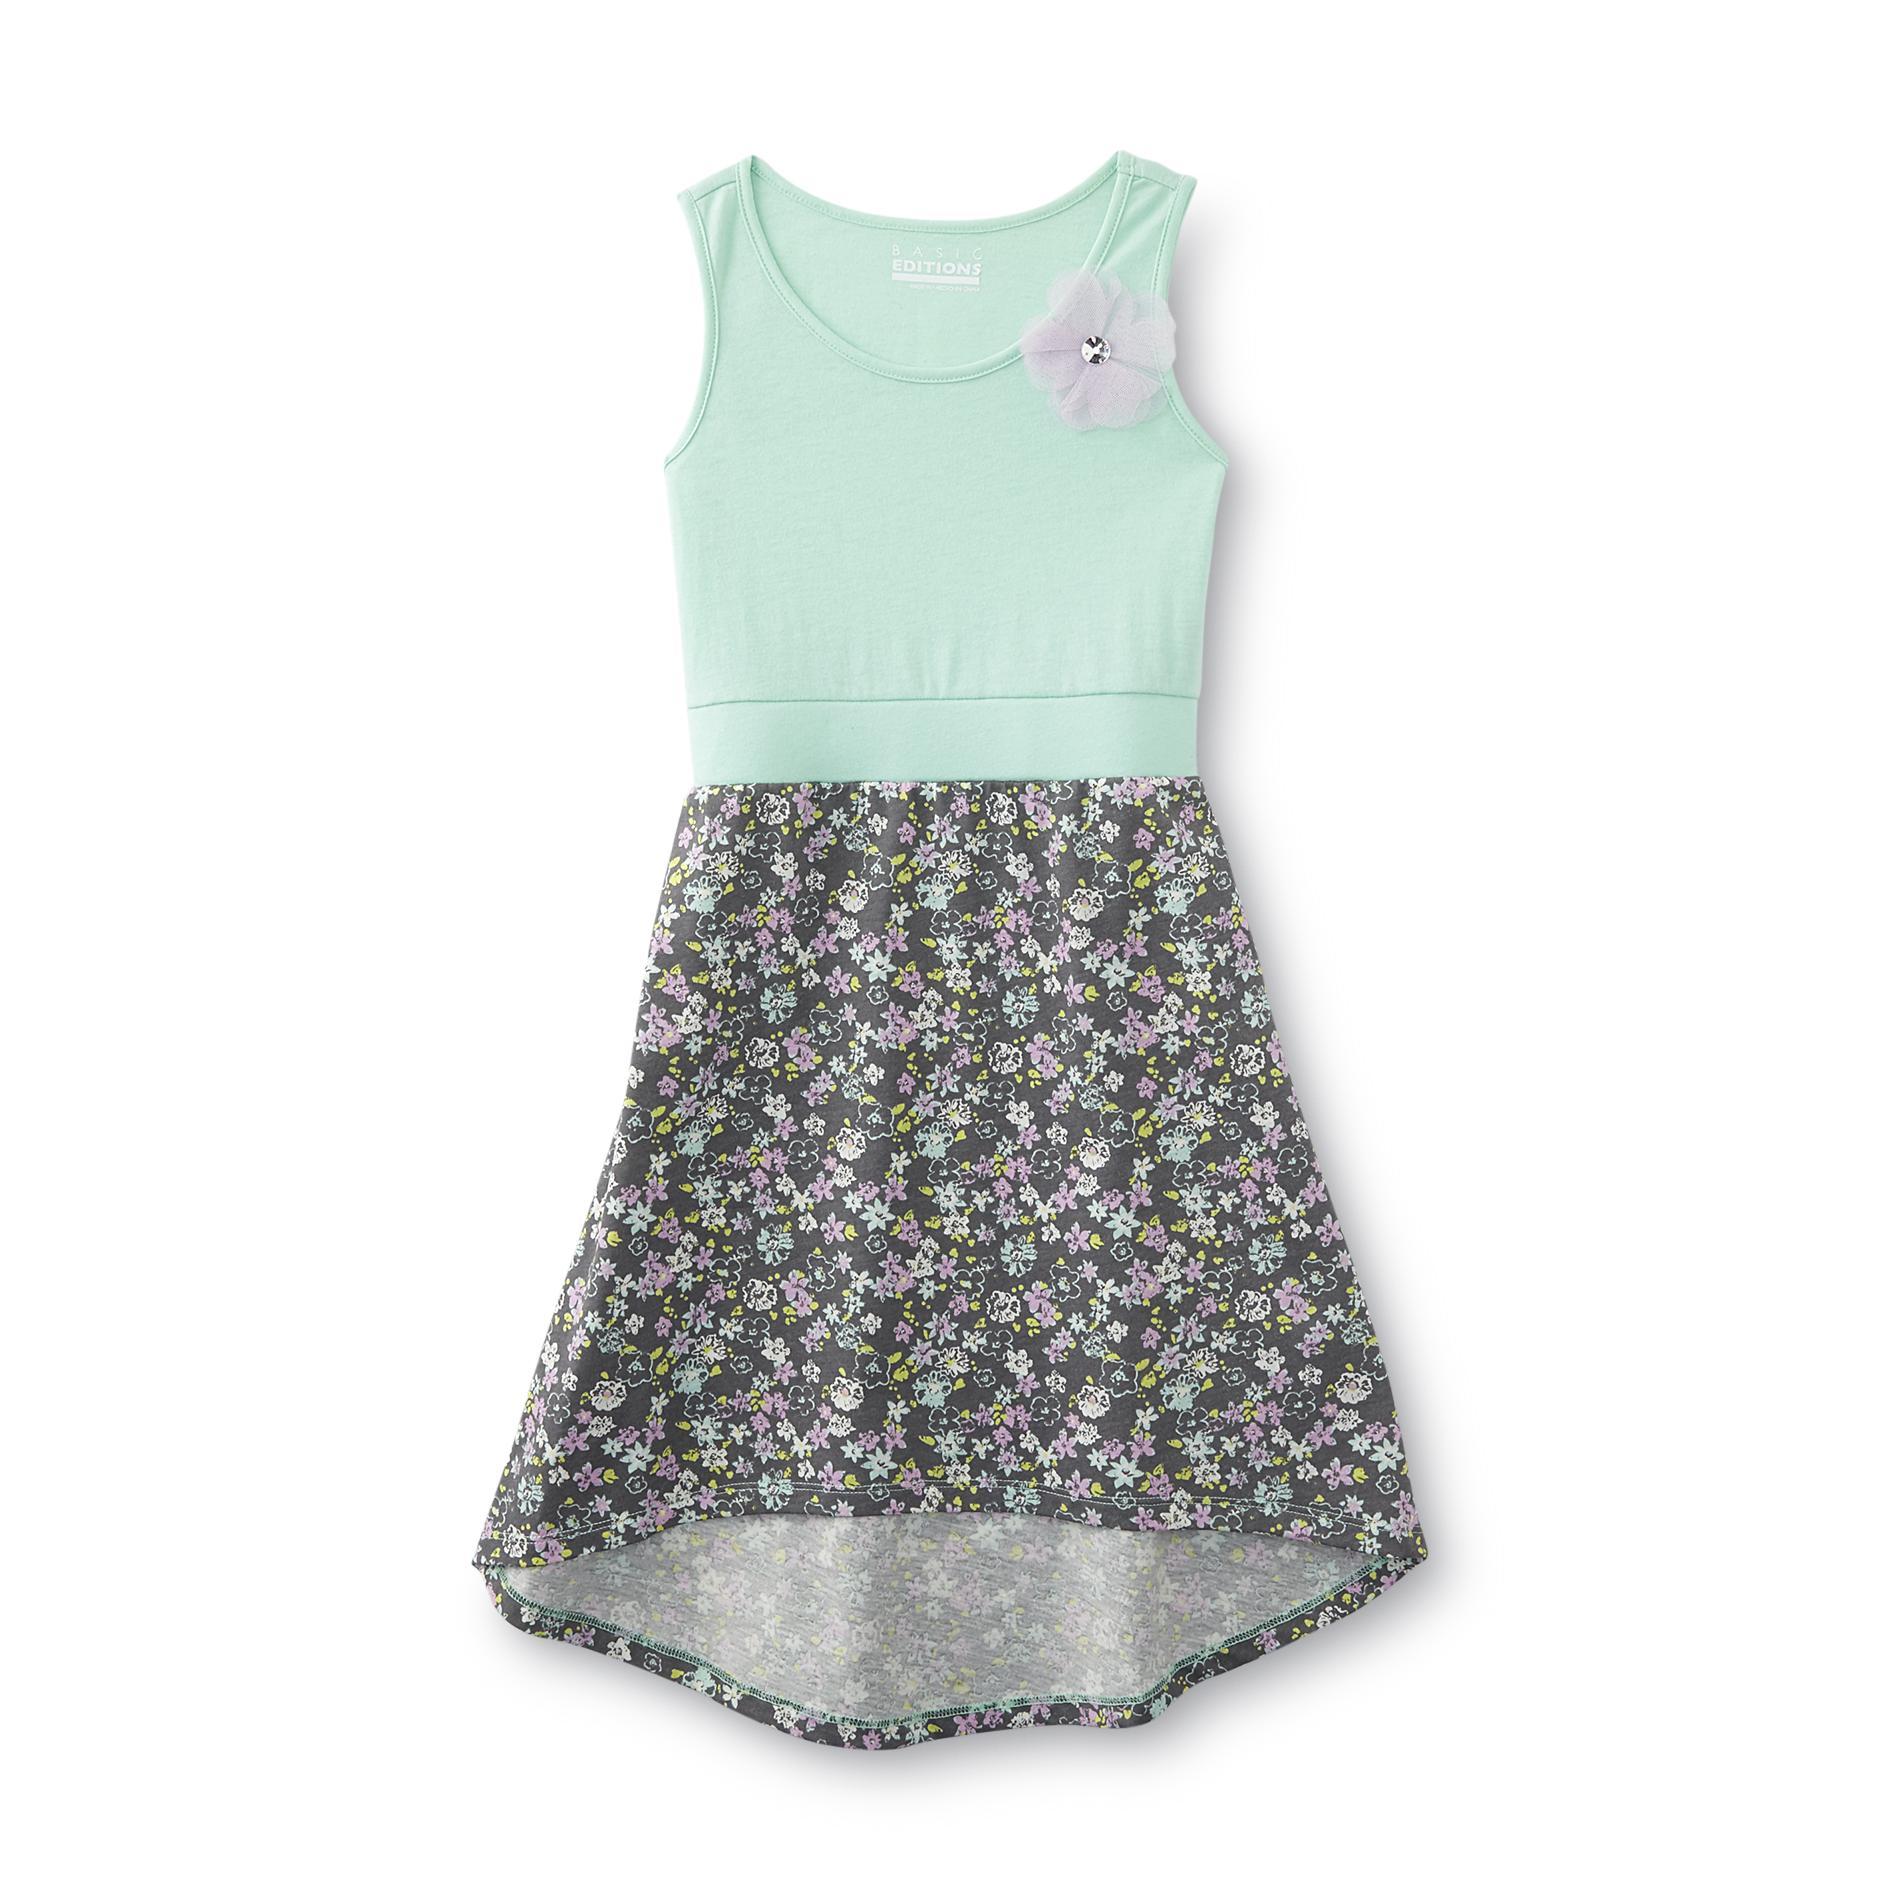 Basic Editions Girl's Sleeveless Dress - Floral